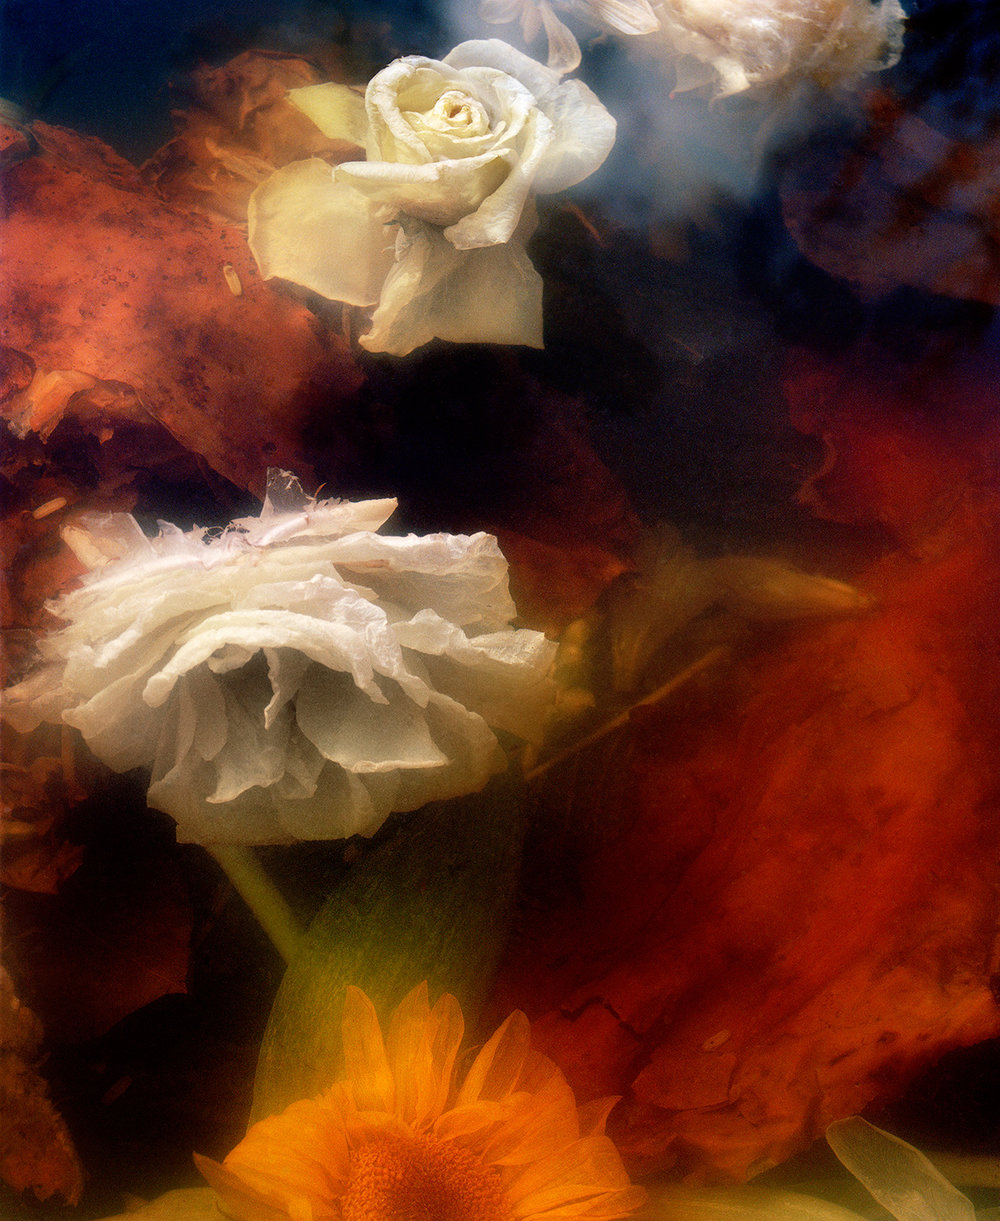 Dark Matter #13 (Sinking Rose and Sunflower)